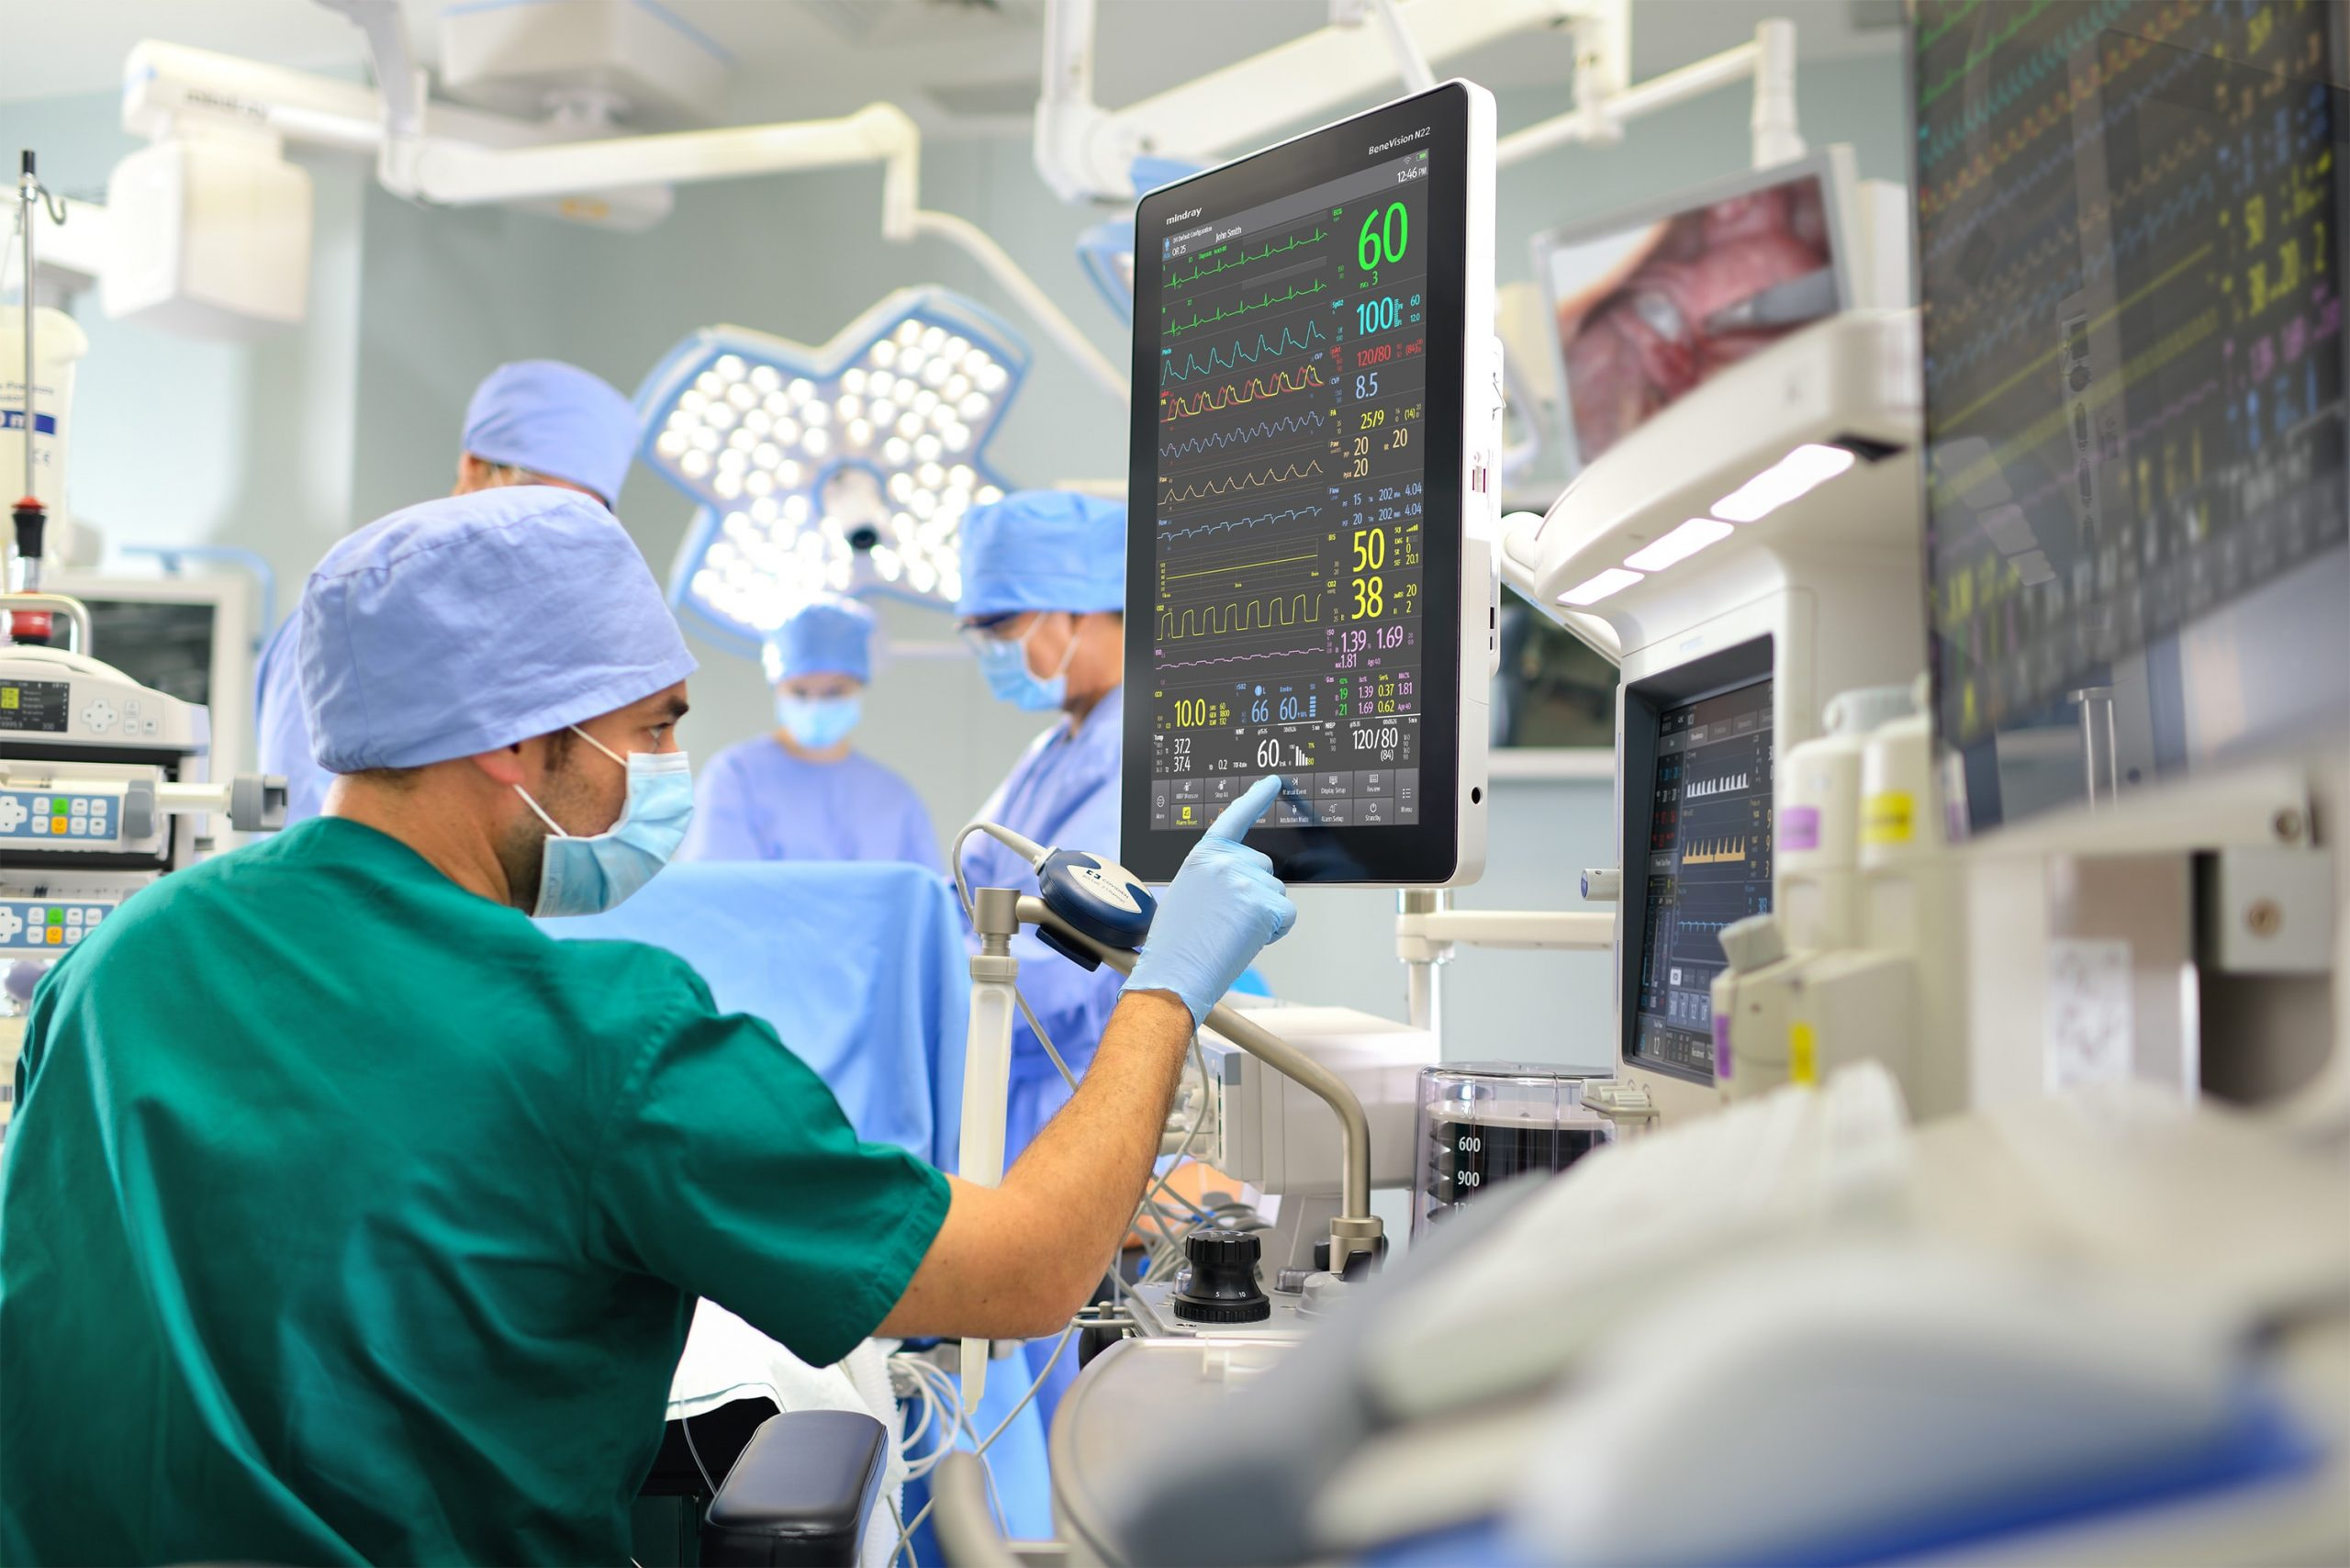 How to Run an Efficient Hospital